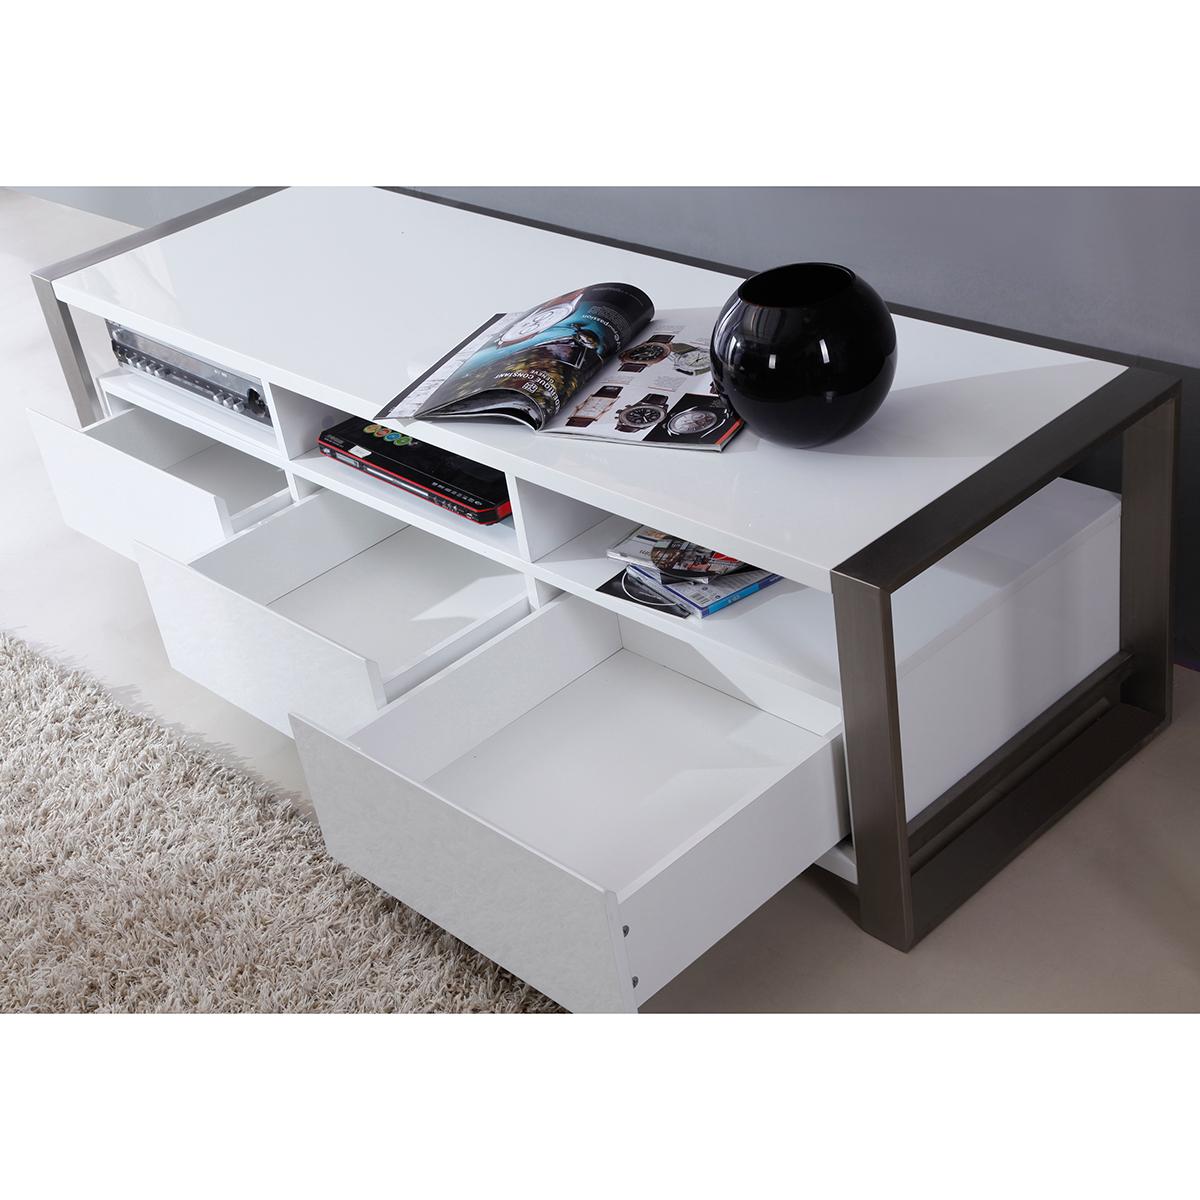 bmodern furniture bmwht stylist  contemporary tv stand in  - stylist  contemporary tv stand in high gloss white lacquer